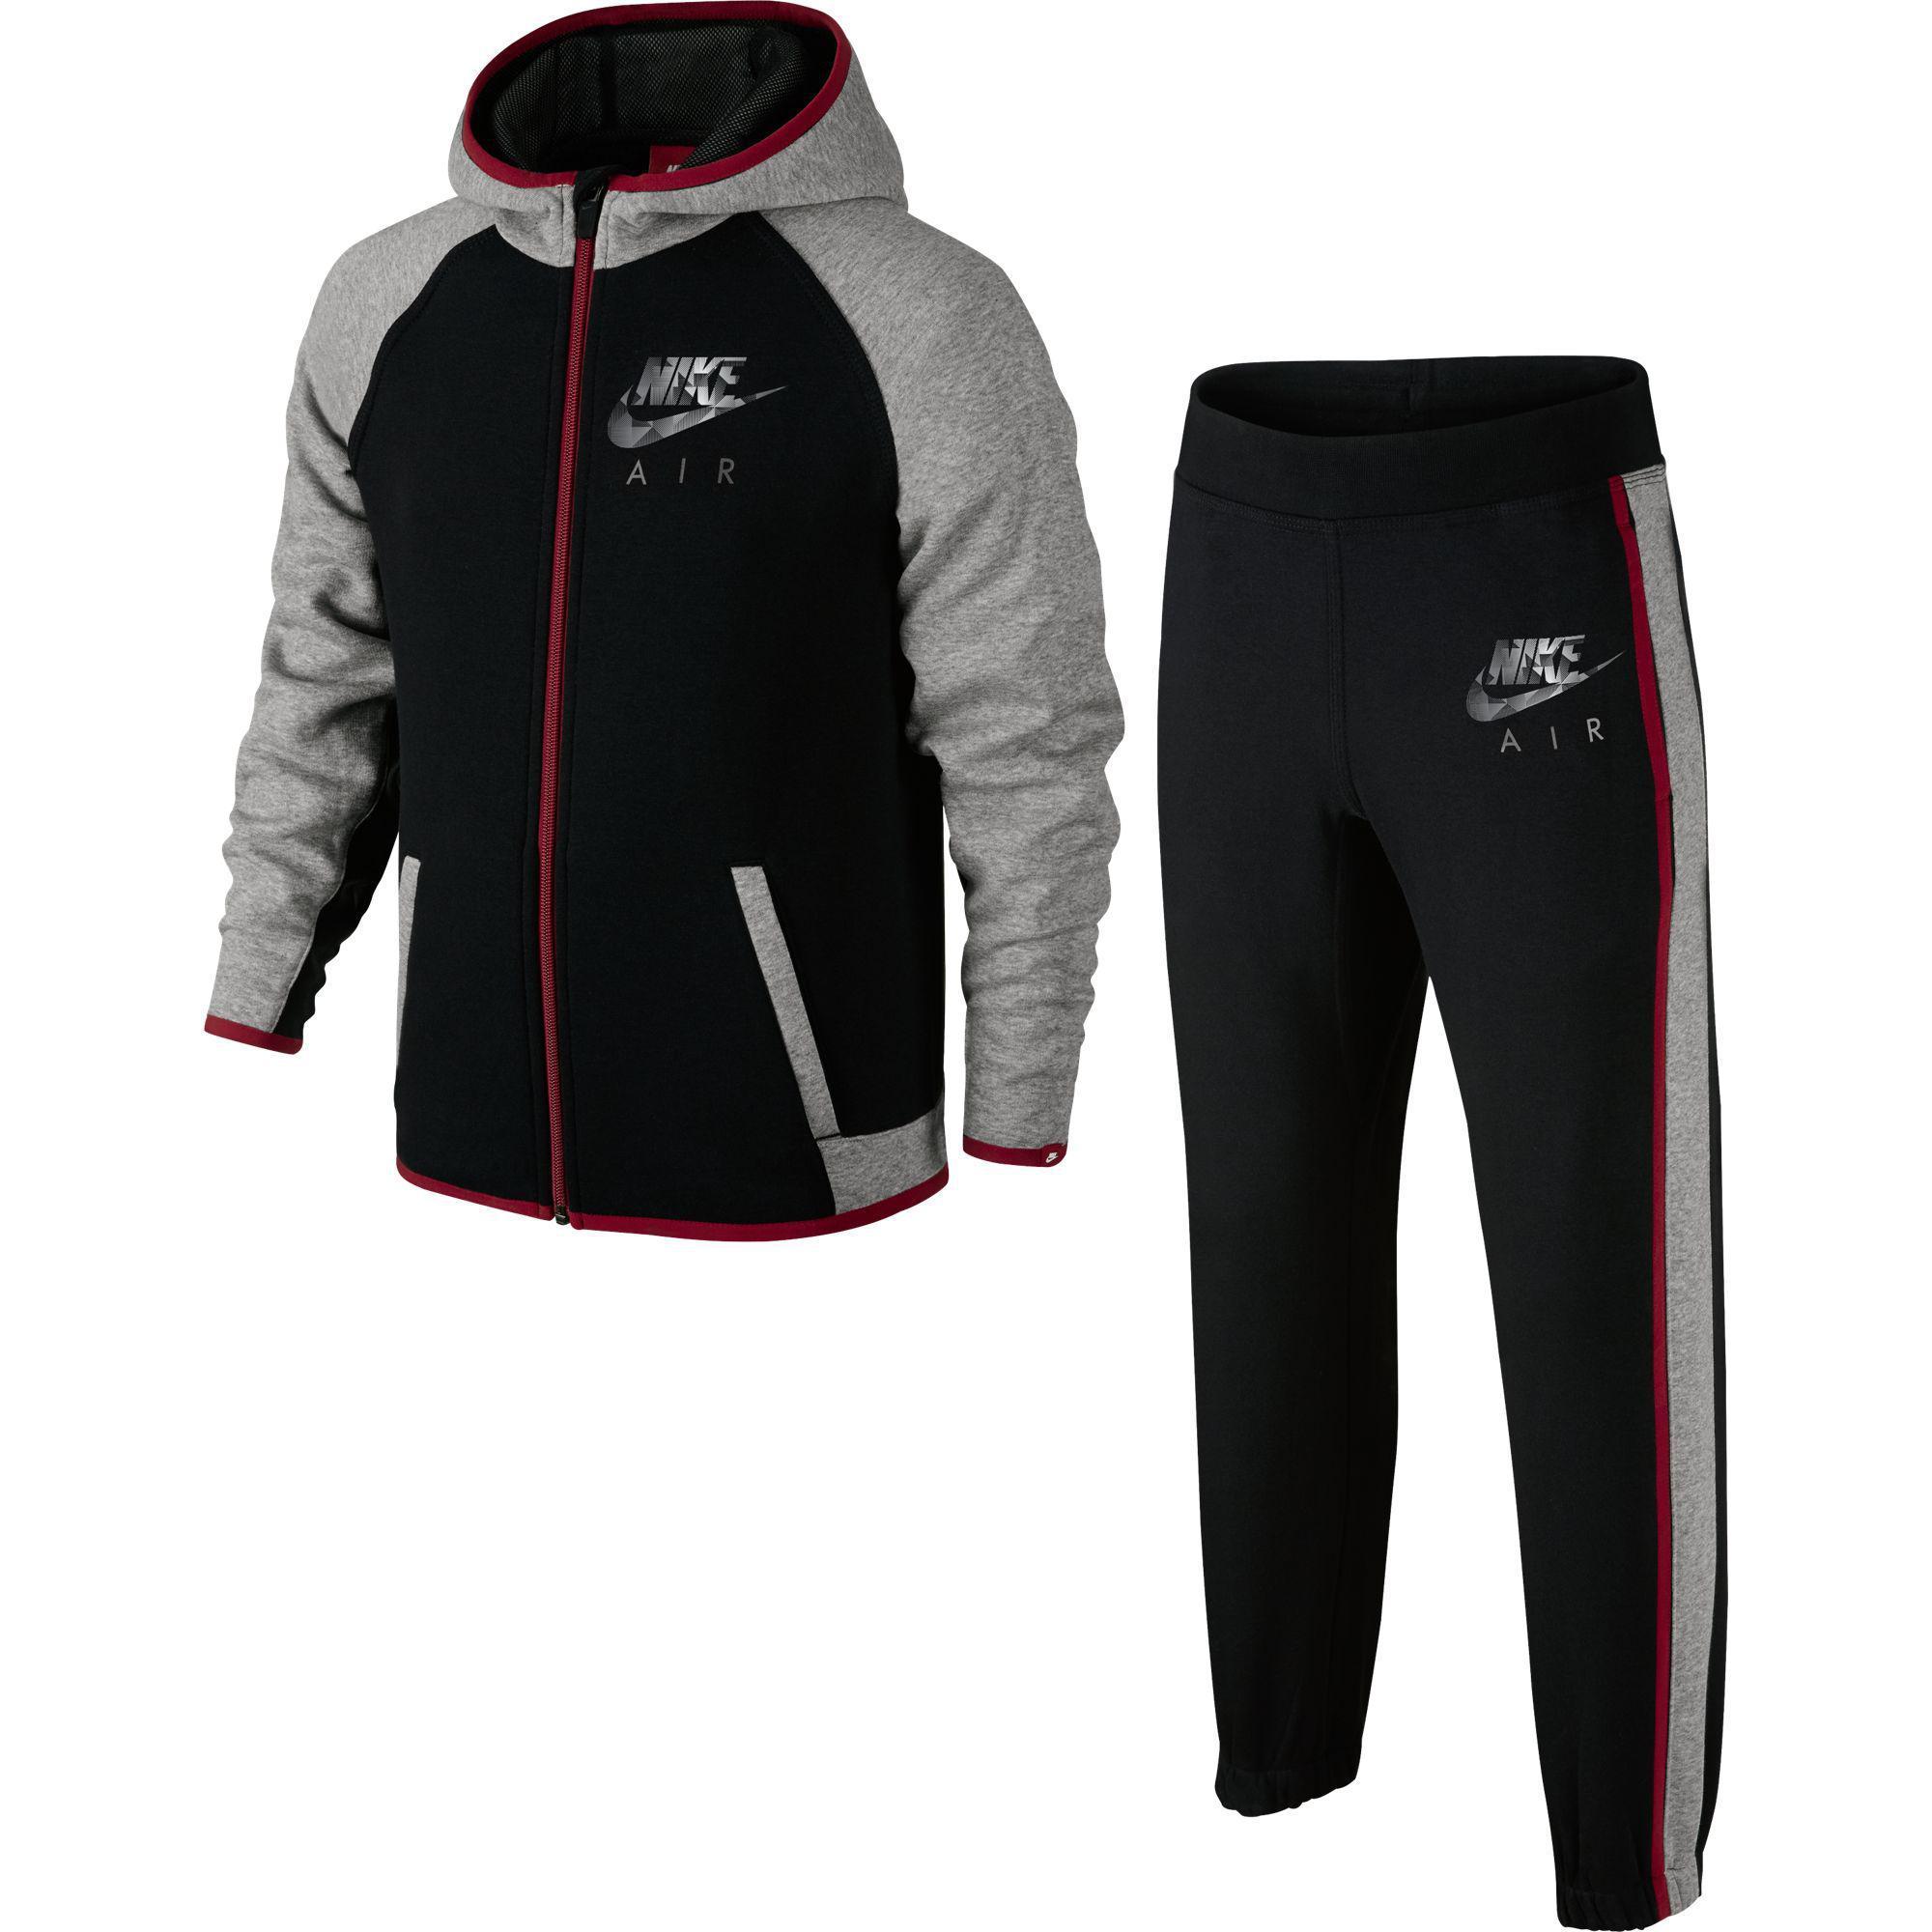 025965a8 Nike Boys Brushed Fleece Tracksuit - Black/Grey - Tennisnuts.com